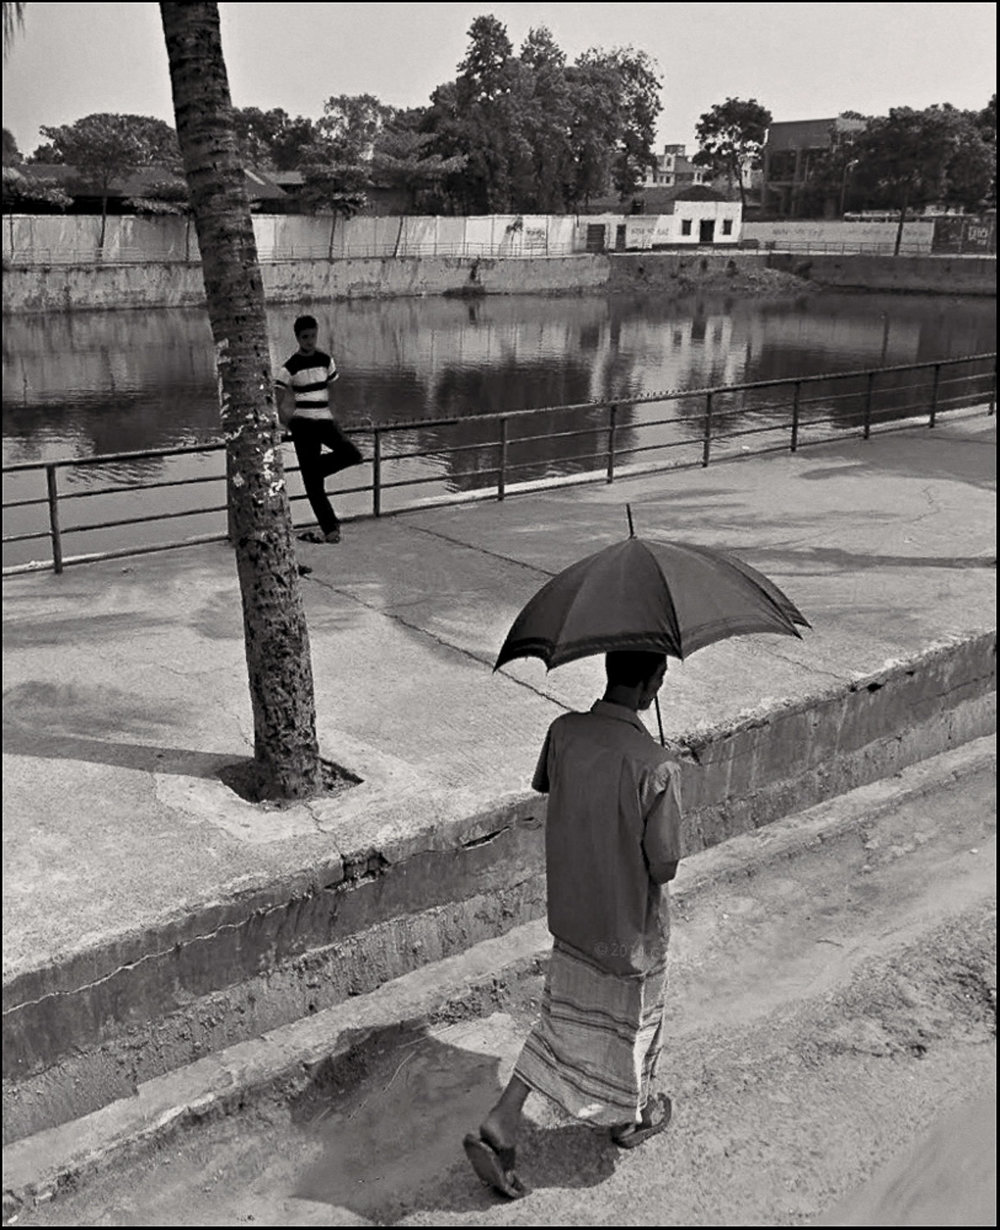 bangladesh_017bw-Edit-9-94.jpg